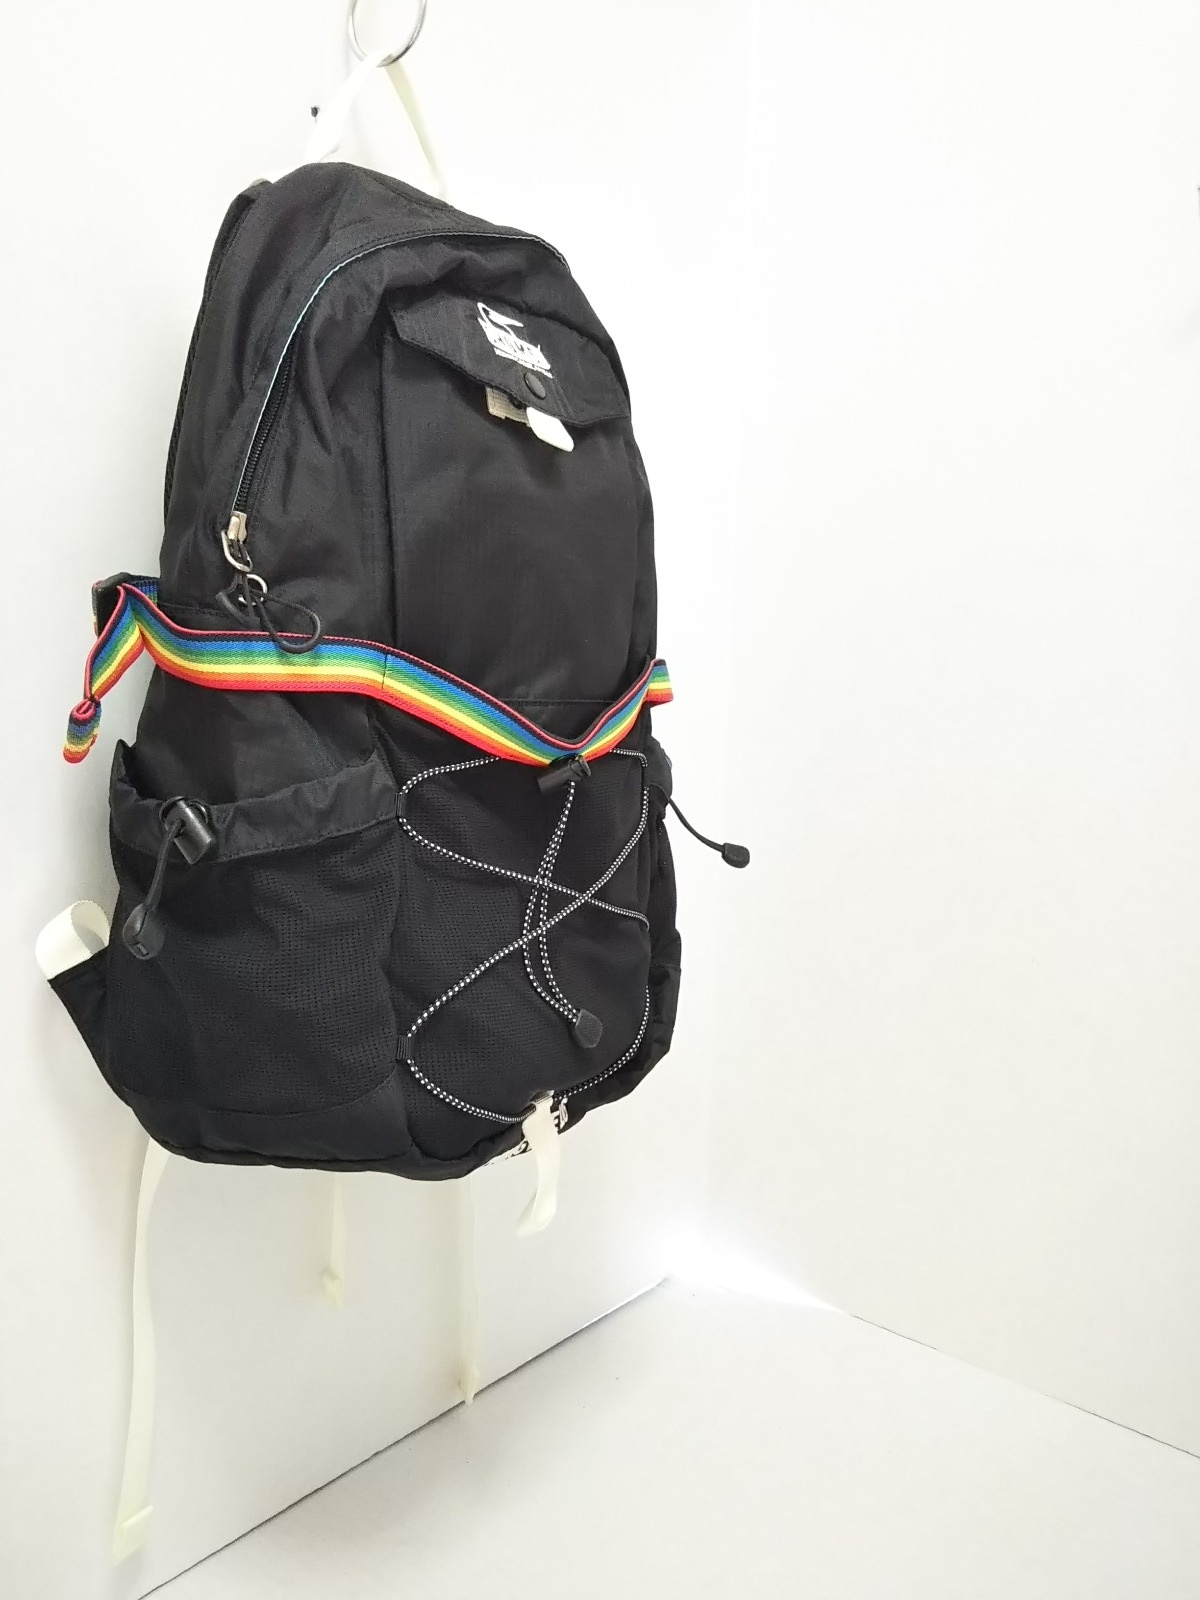 98687330725a CHUMS(チャムス) リュックサック美品 黒 ナイロン(13123688)中古 ...